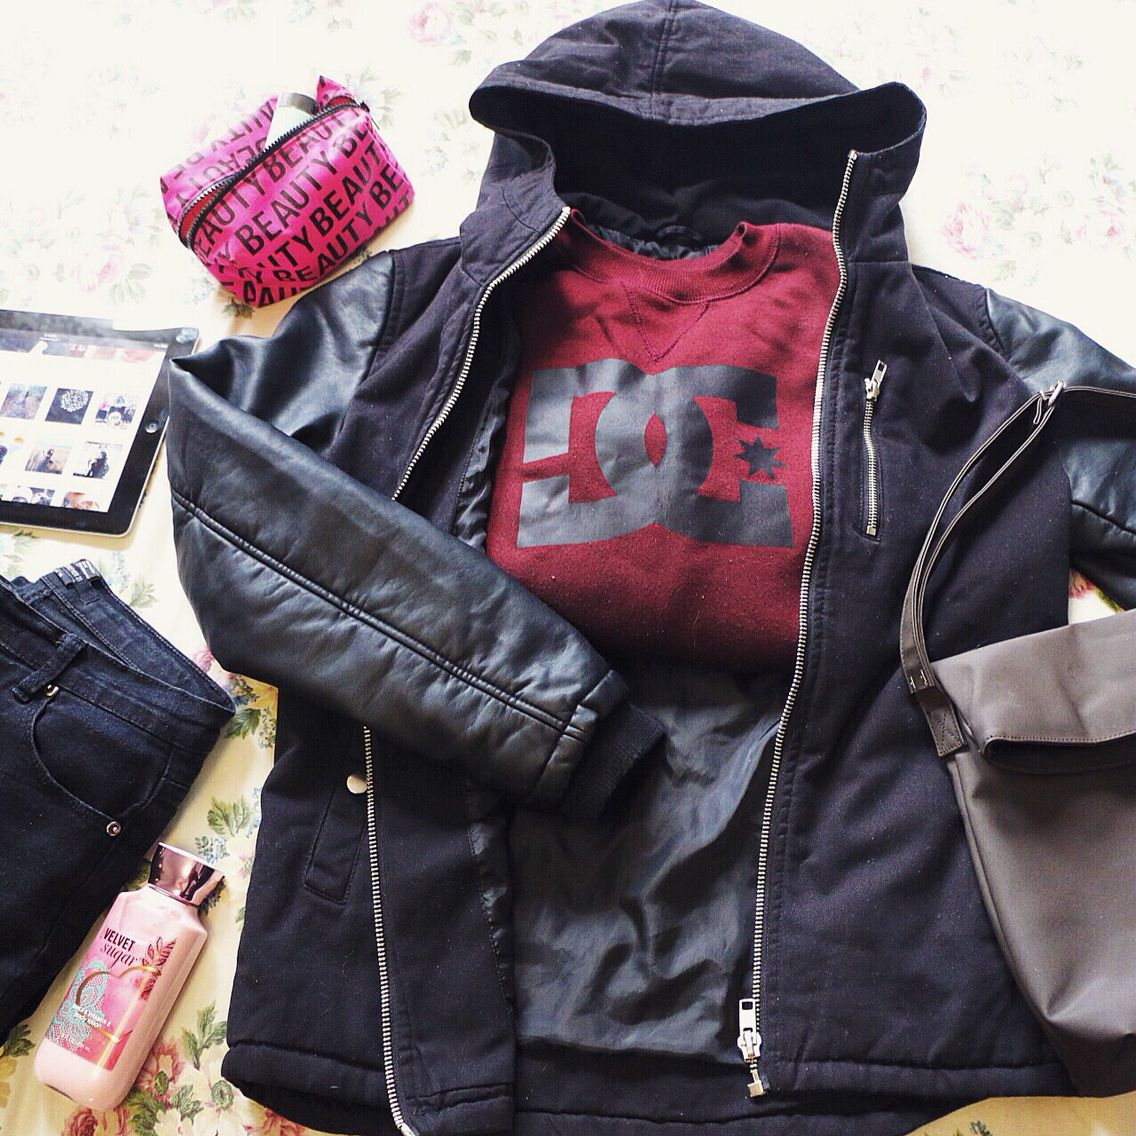 hello 36 F im ready  | men jacket, jeggings: forever21 | sweatshirt: DC | hand bag: evan-picone #mushieootd #winterootd